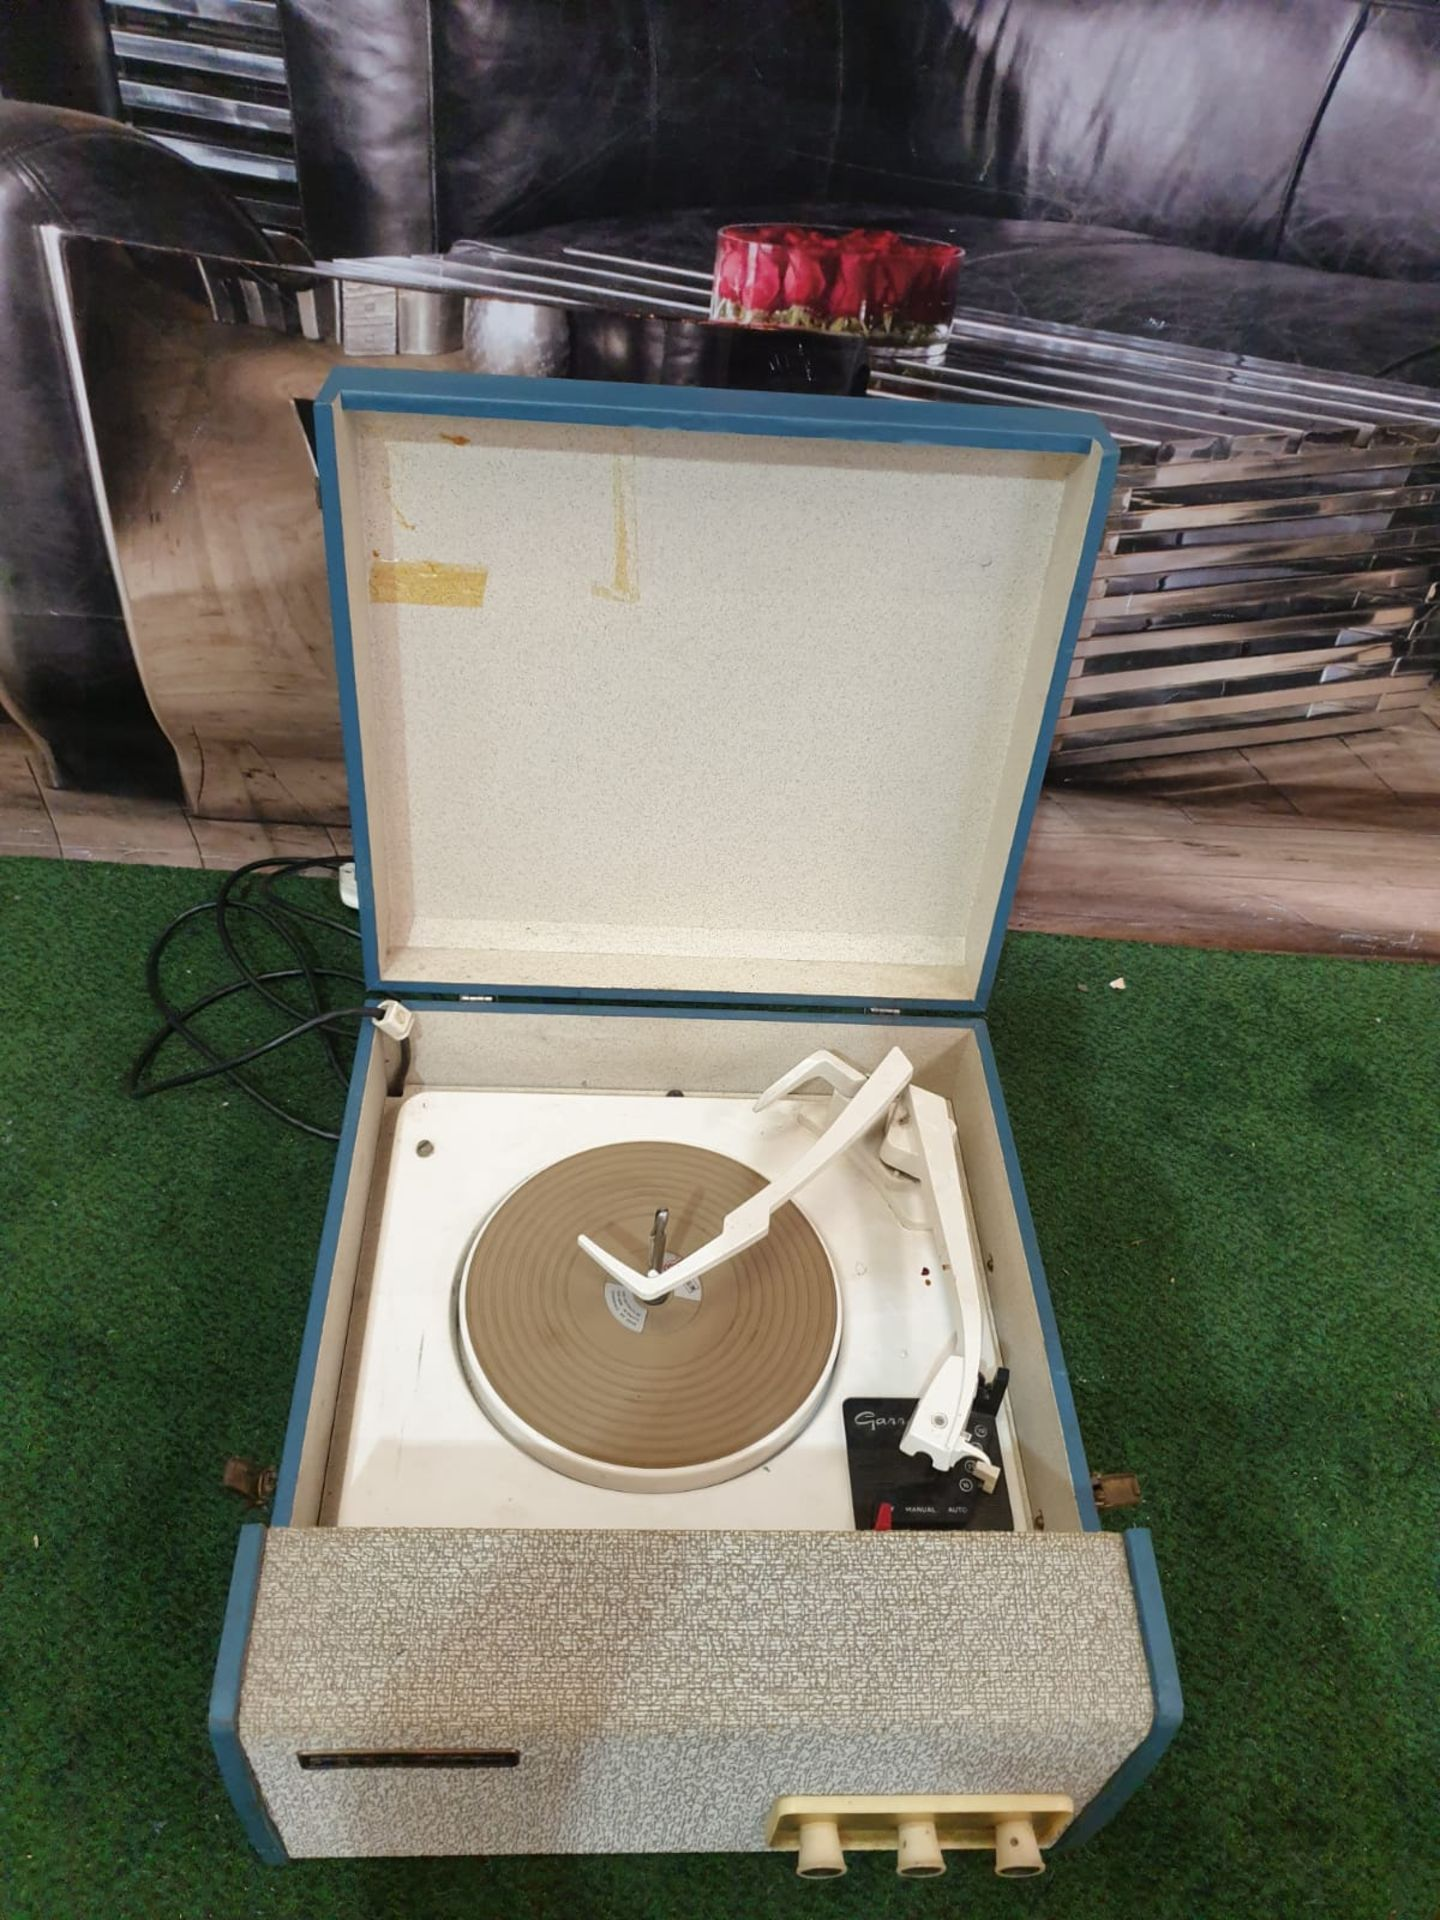 Travel record Player Blue Case Made By Ferranti Circa 1958 Ferranti or Ferranti International plc - Image 2 of 3